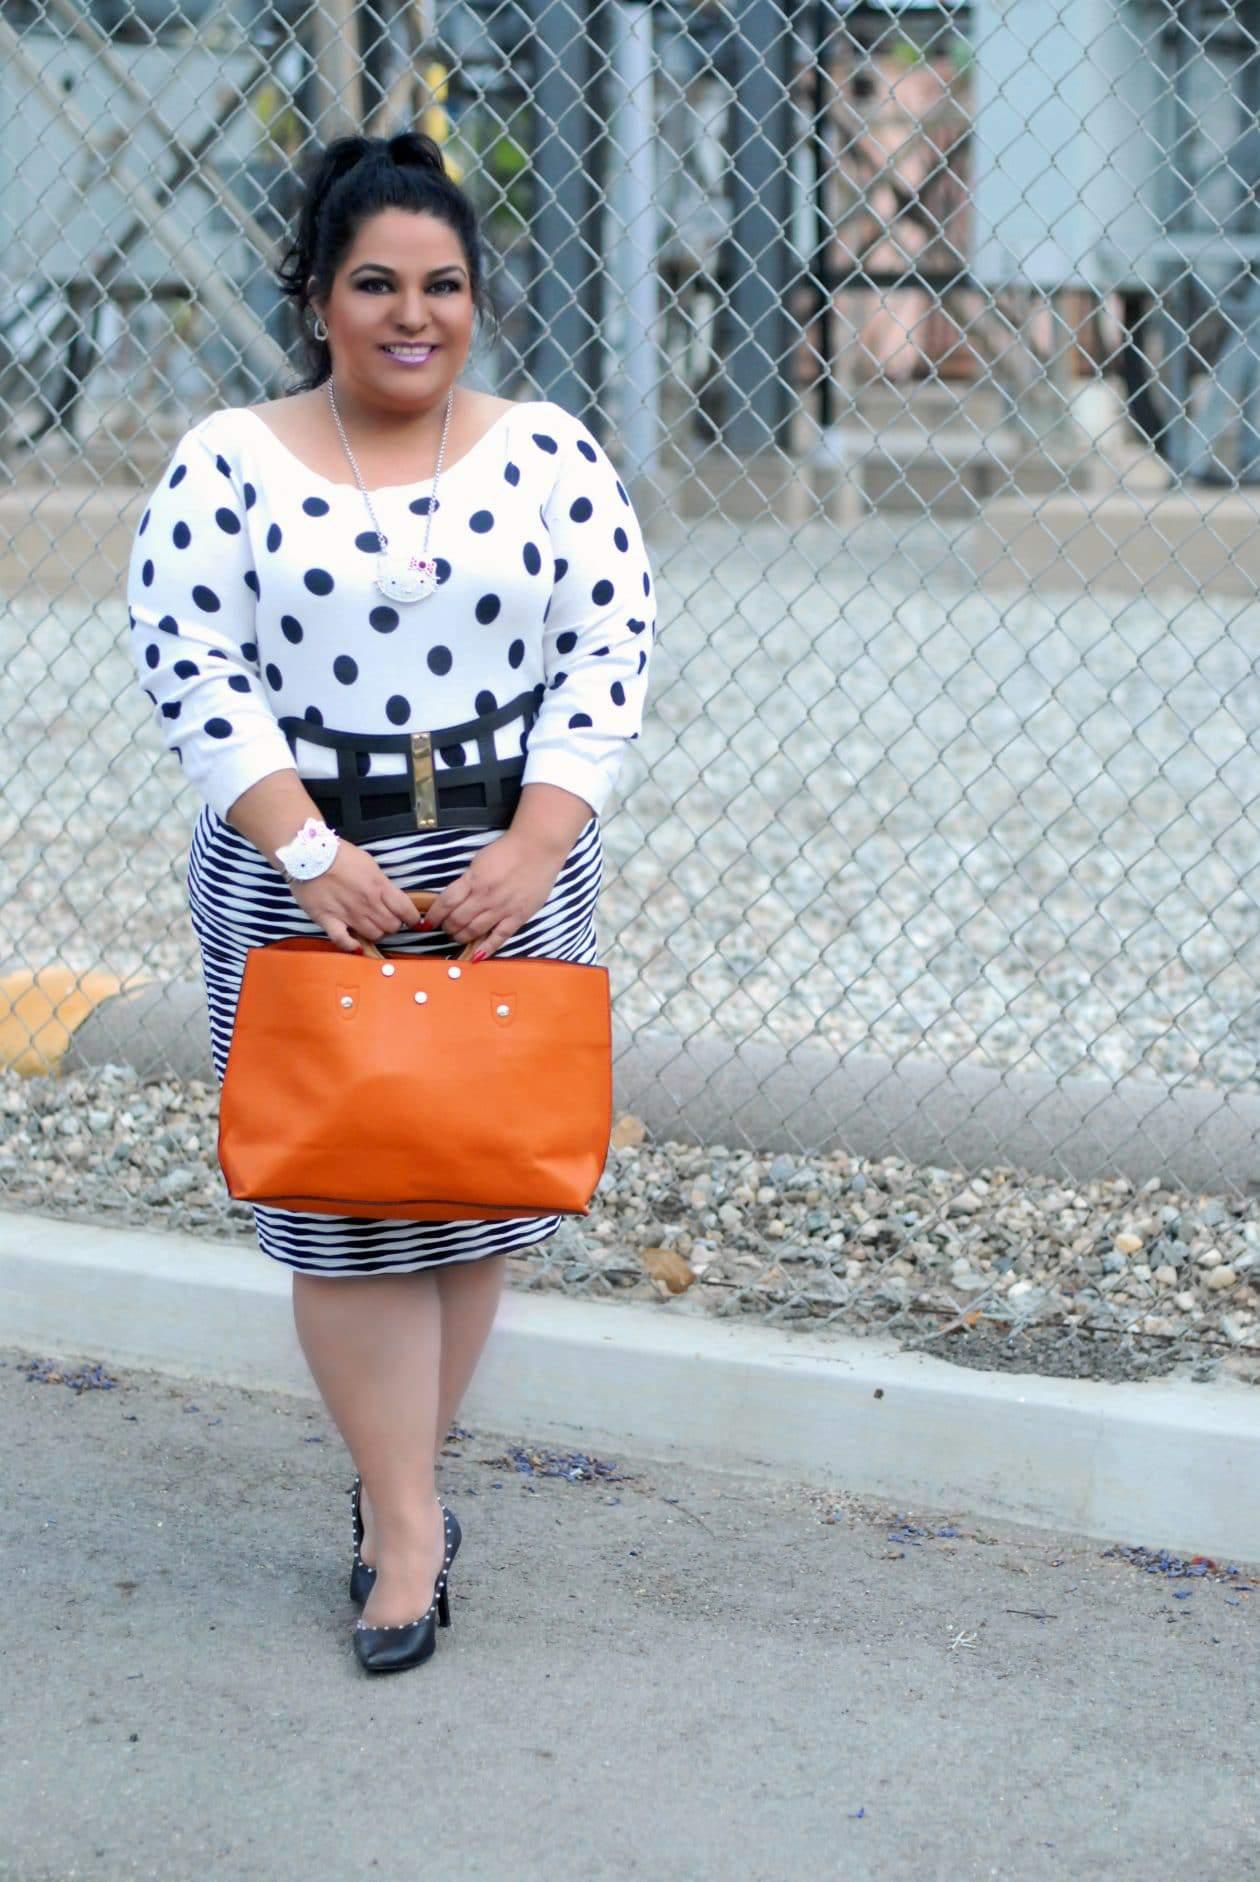 Plus size fashion blogger spotlight- MizLiz from BBW Generation